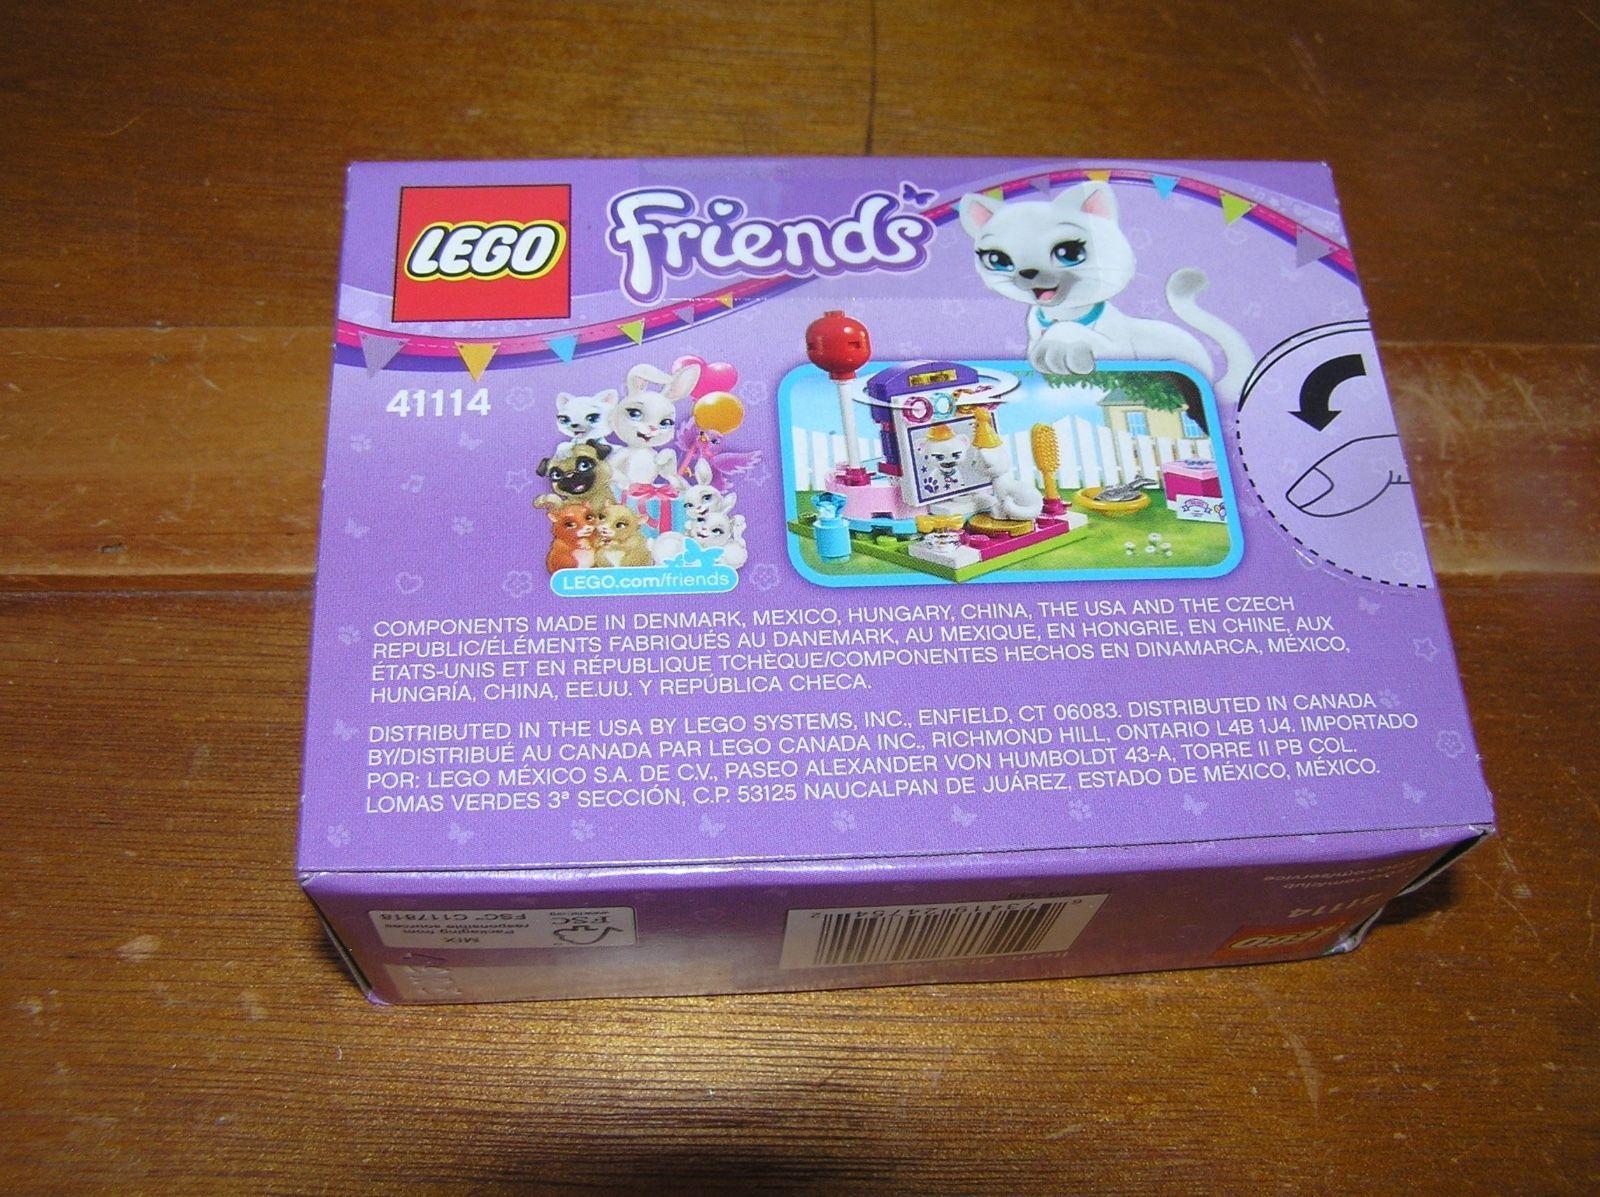 Friends NEW Lego Belville Princess Violet PURPLE DISPLAY CASE w//Pink Jewel Gem